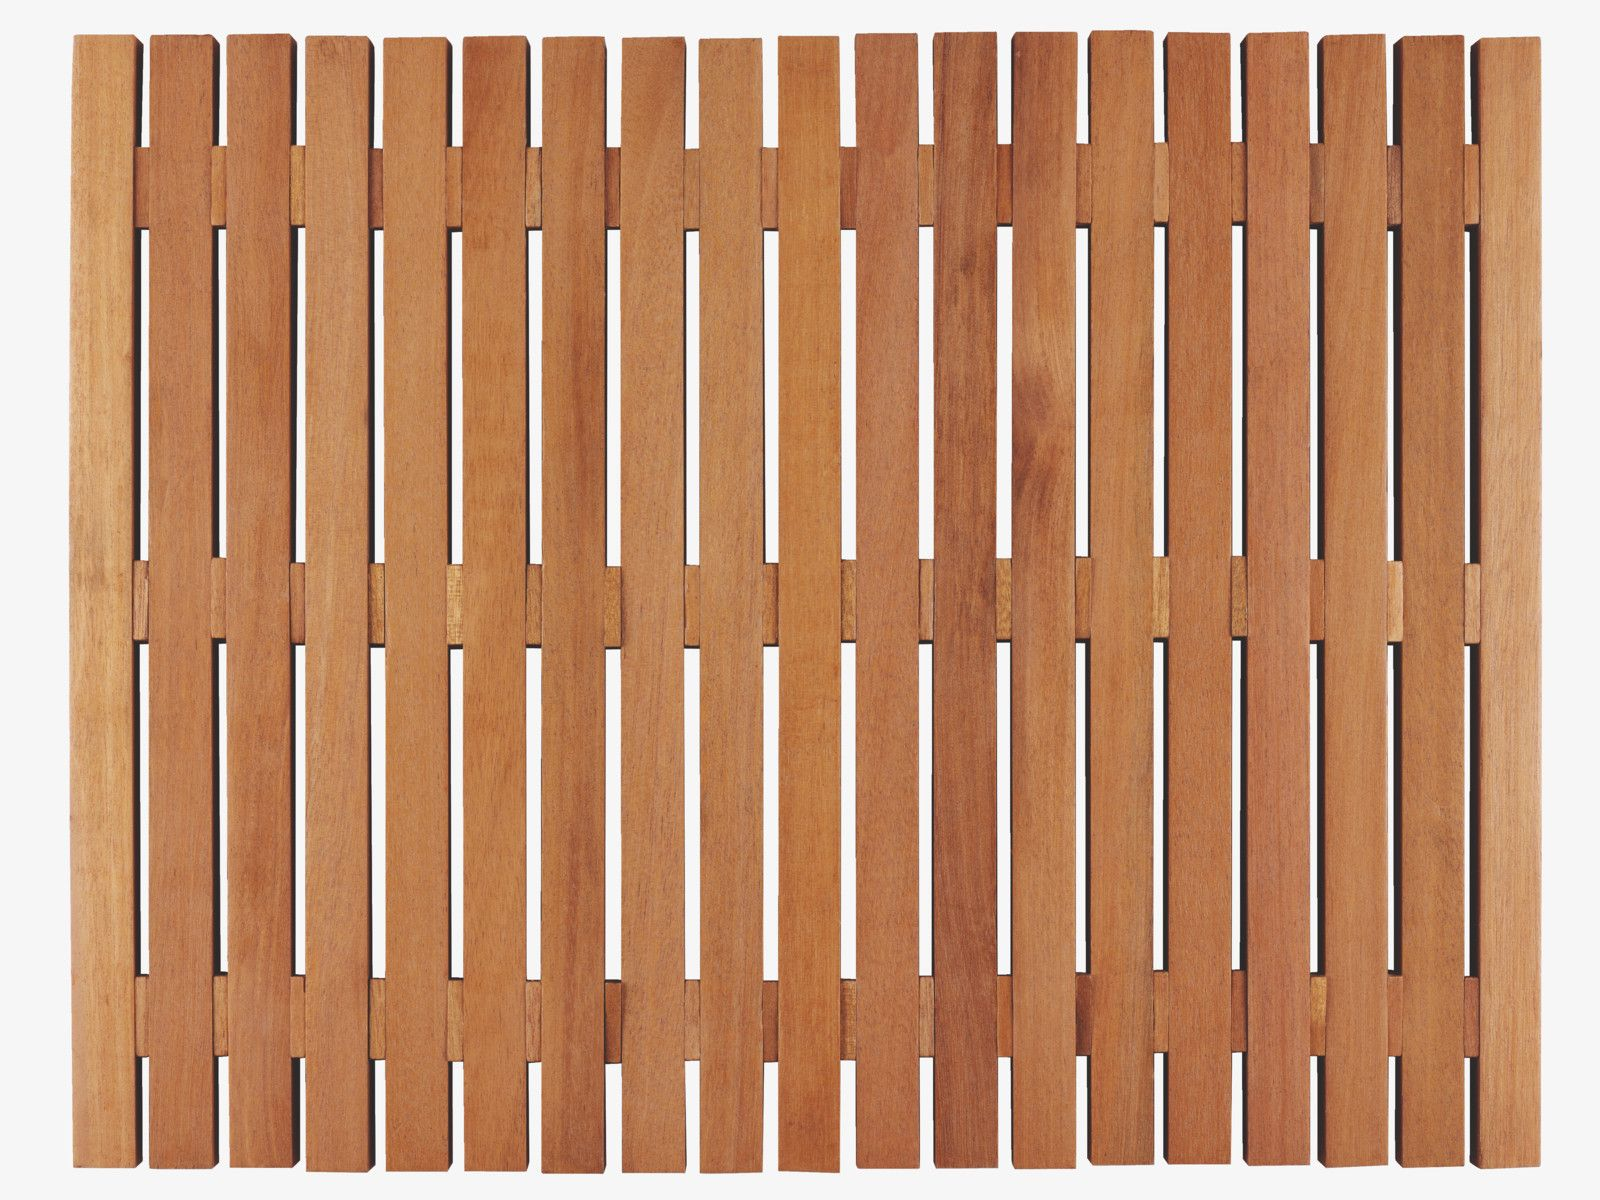 PAPUA NATURAL Wood Wooden bath mat Bathroom Accessories